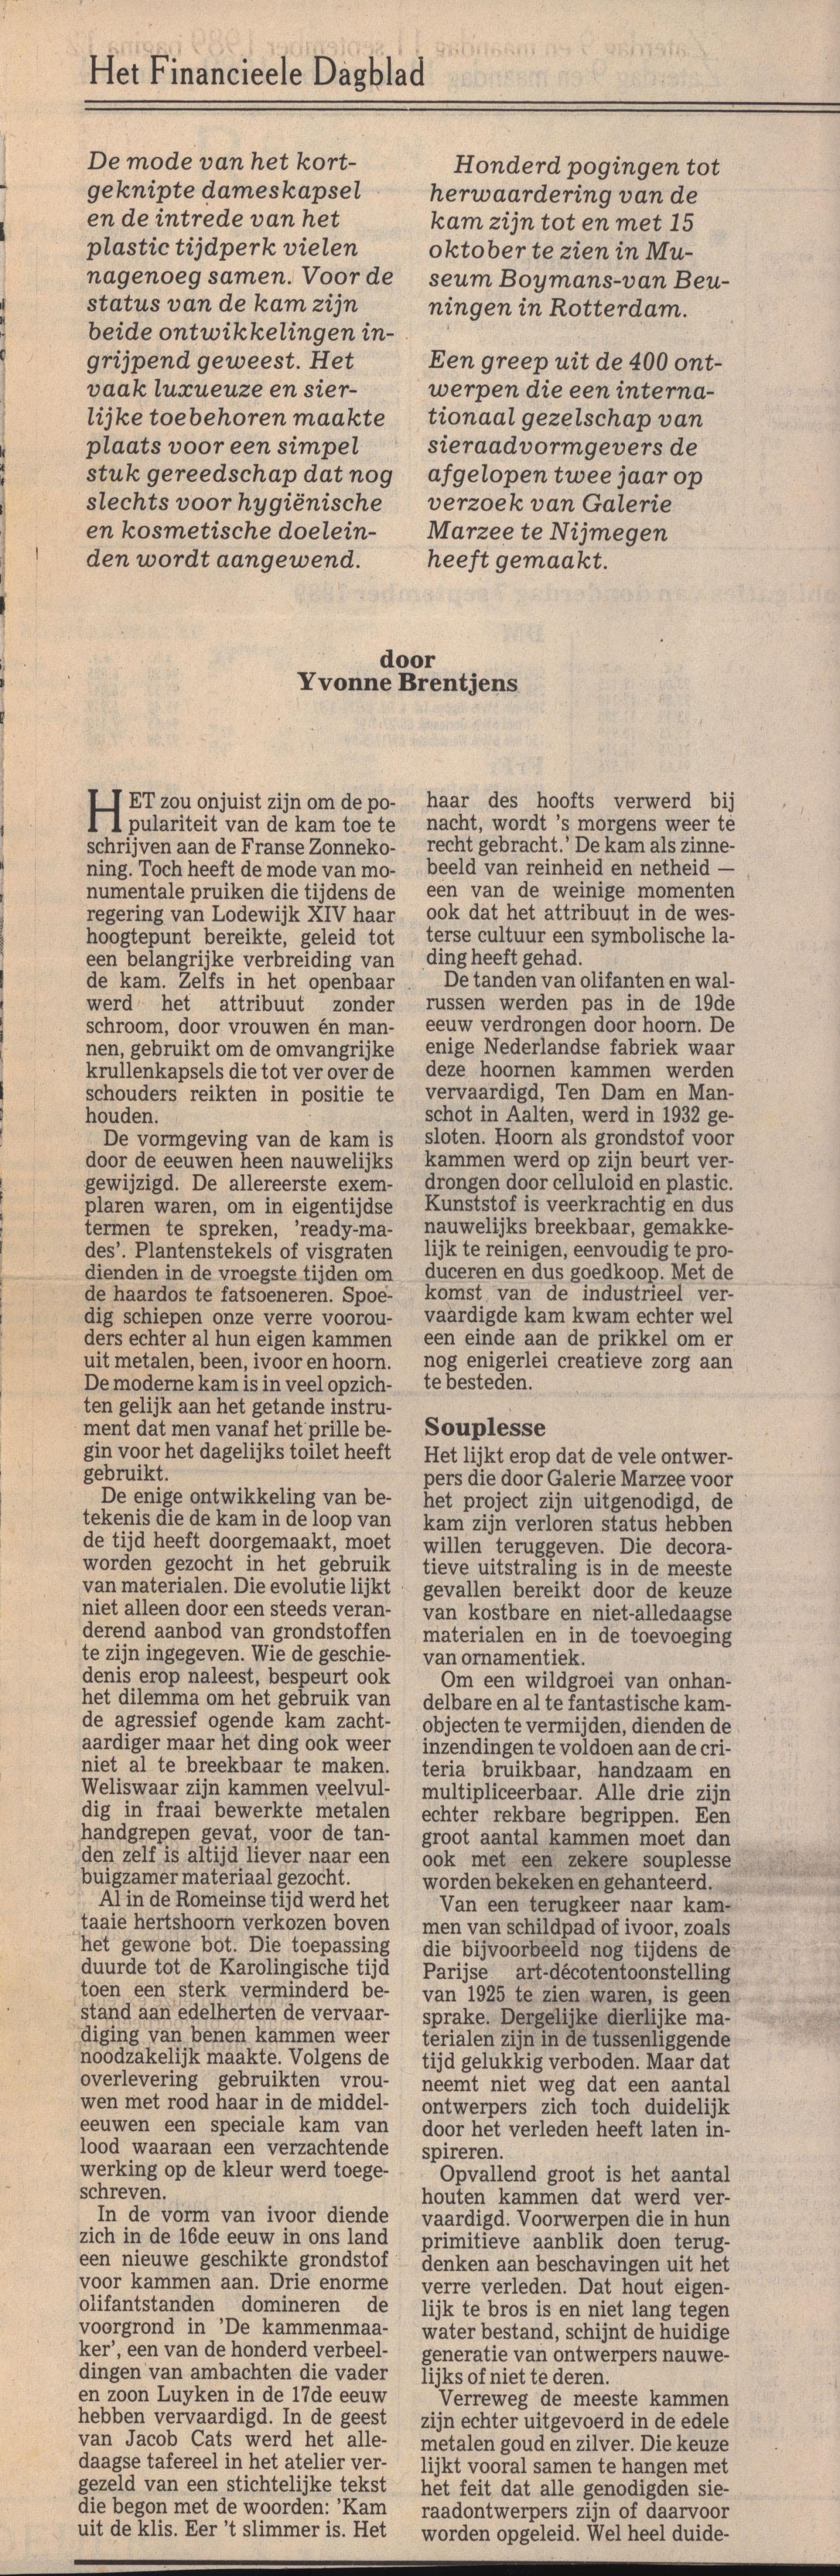 De kam en de tand des tijds, Financieel Dagblad, 11 september 1989, krant, papier, Yvonne Brentjens